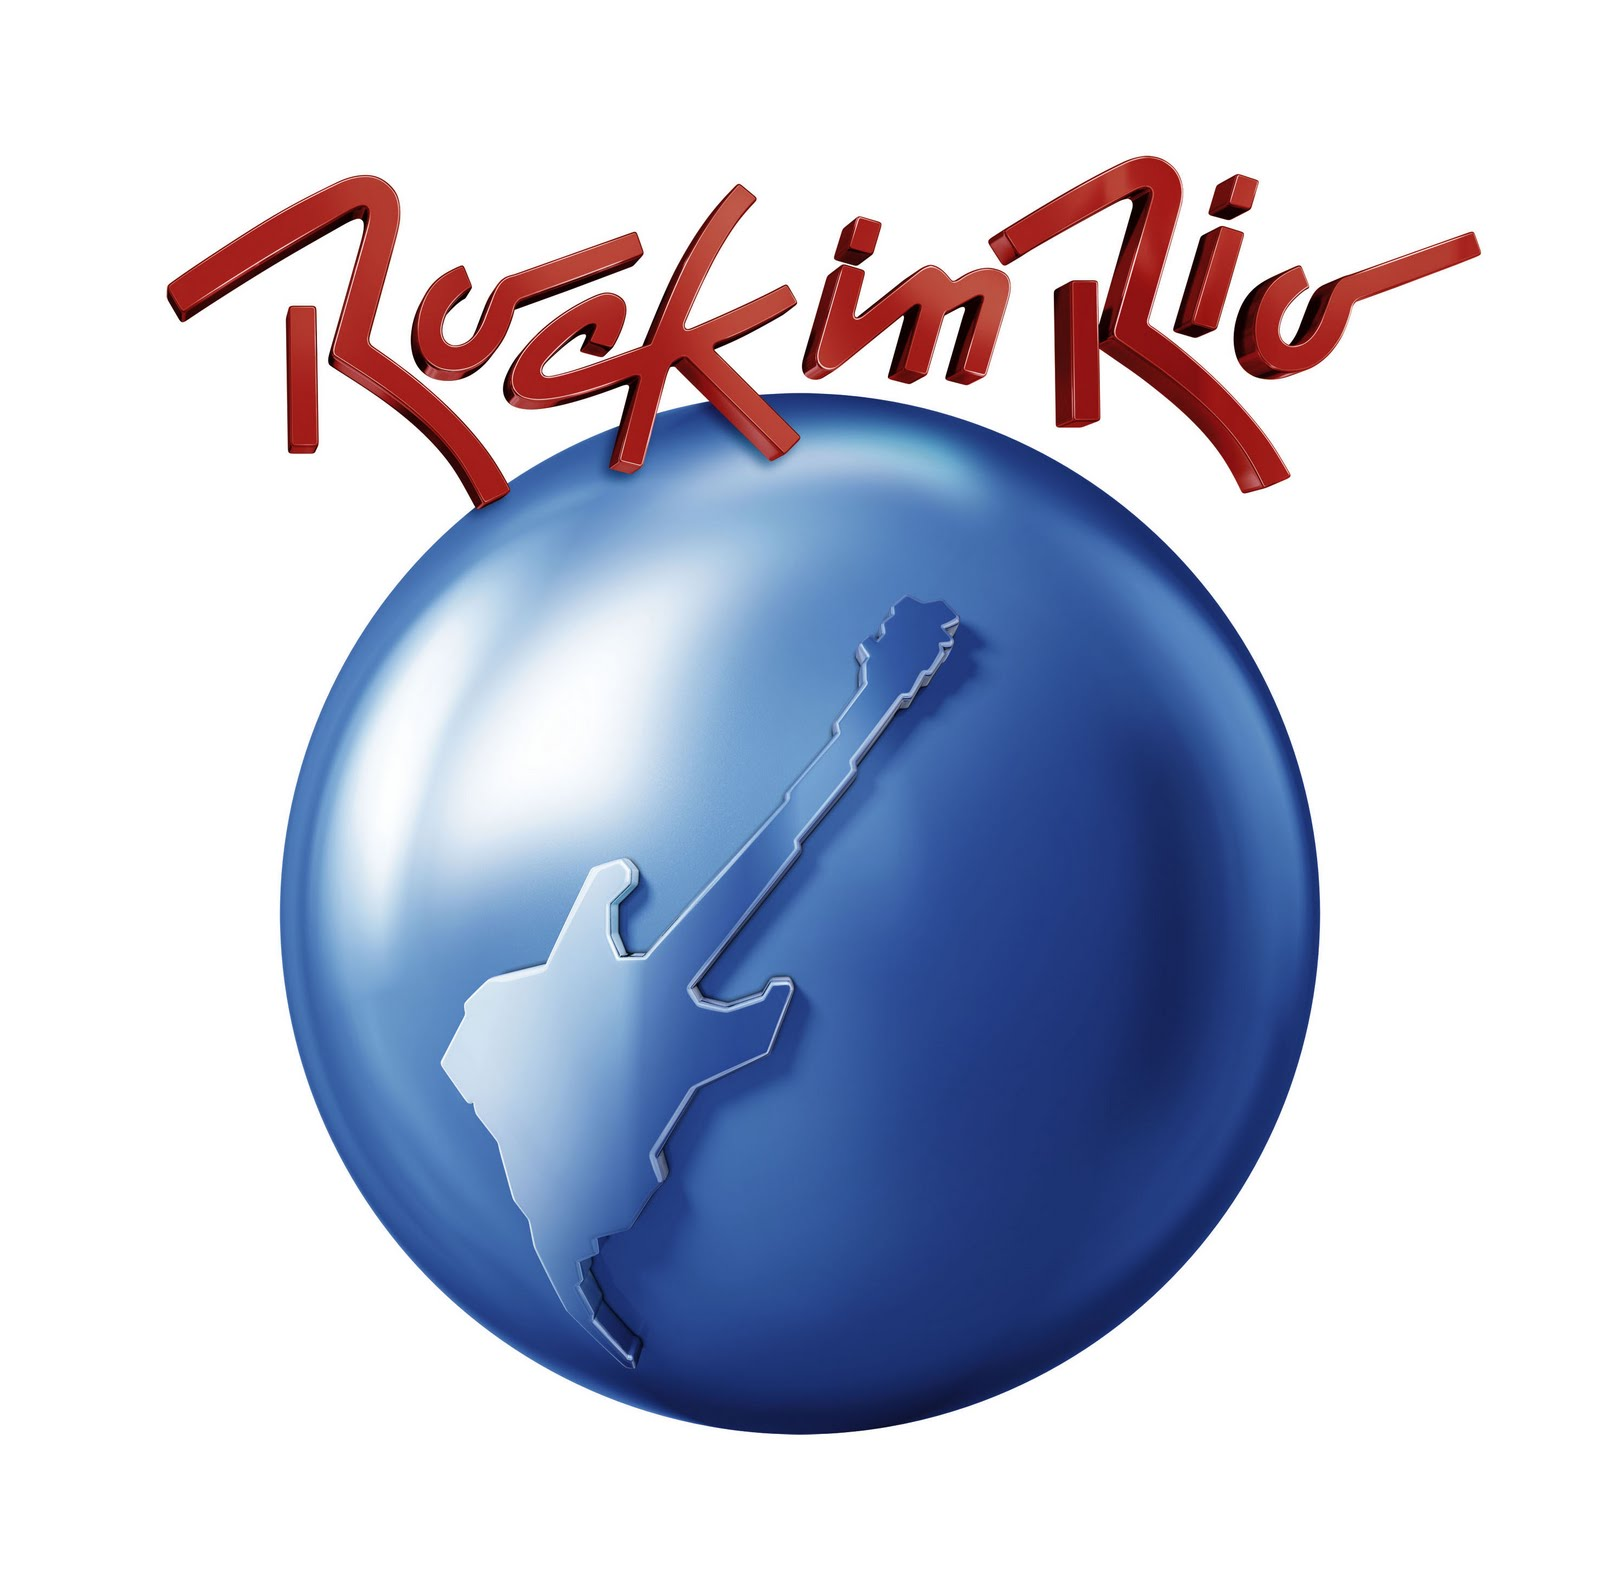 http://3.bp.blogspot.com/-X0NkchgAw3A/ToZfnIyYN1I/AAAAAAAABGo/nrV3Ca_gsuQ/s1600/logo-rockinrio-2011.jpg